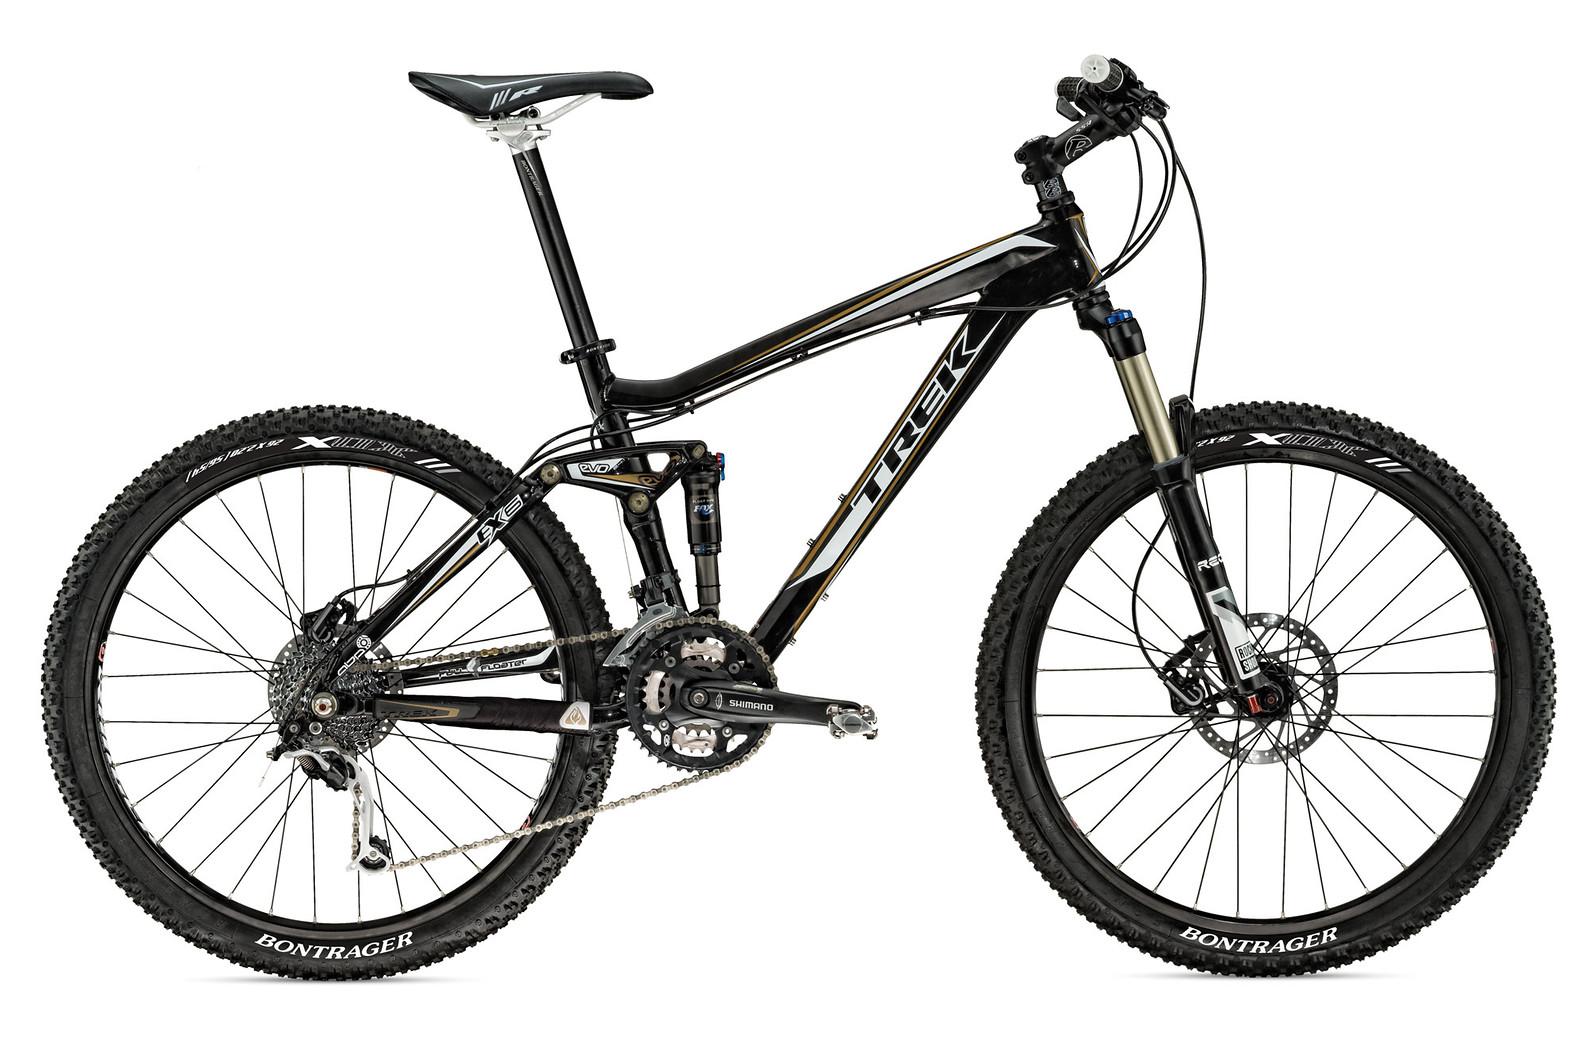 2010 Trek EX 6 Bike fuelex6_black